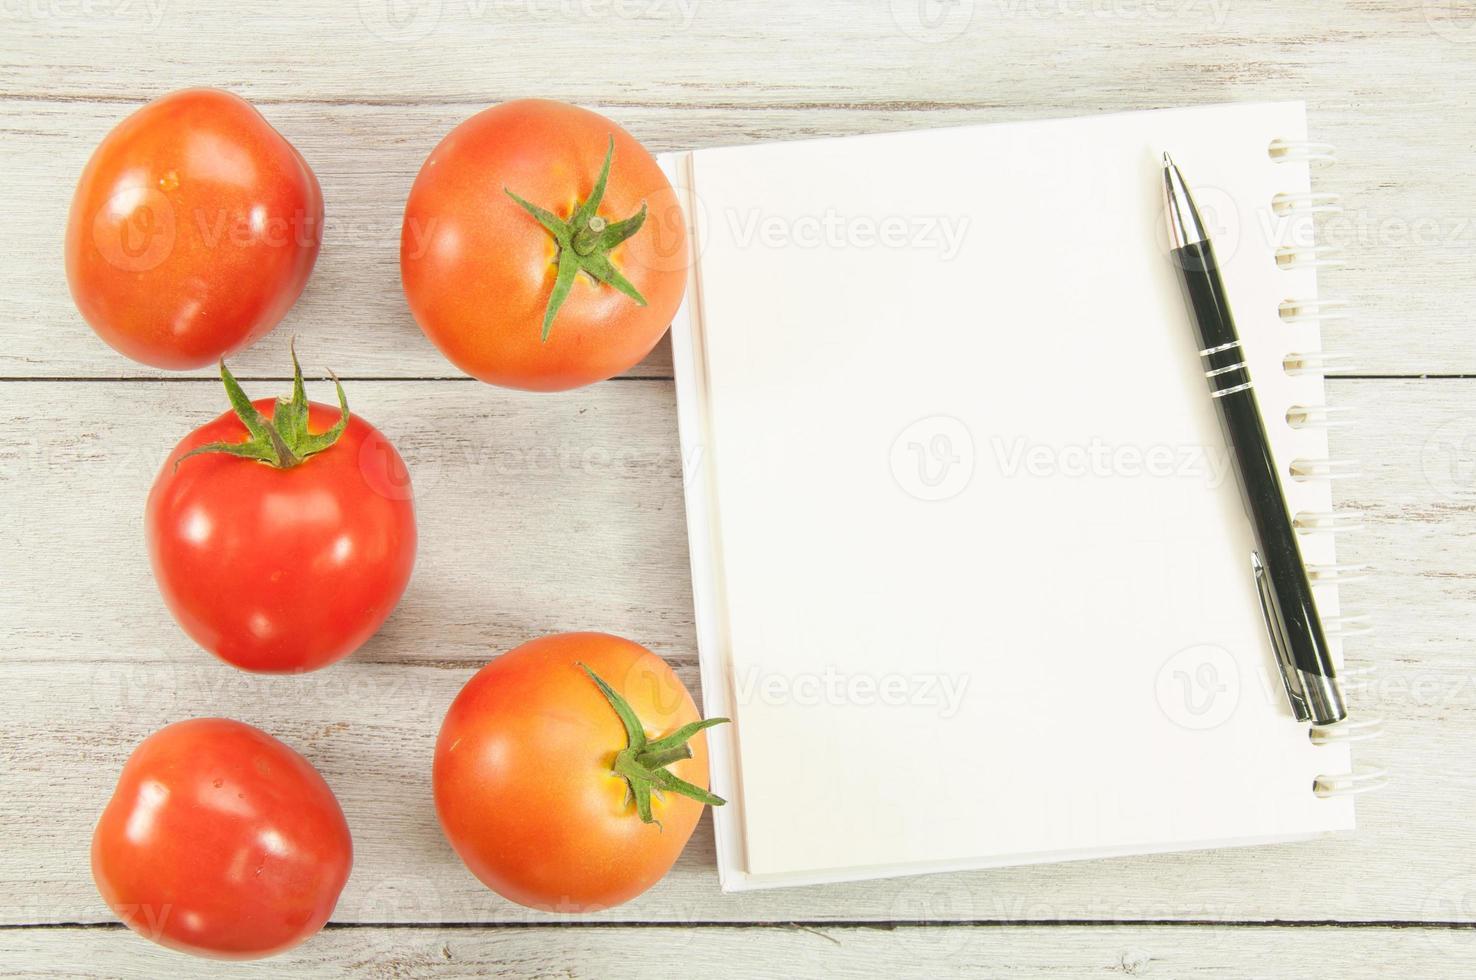 receptbok med ingredienser. foto